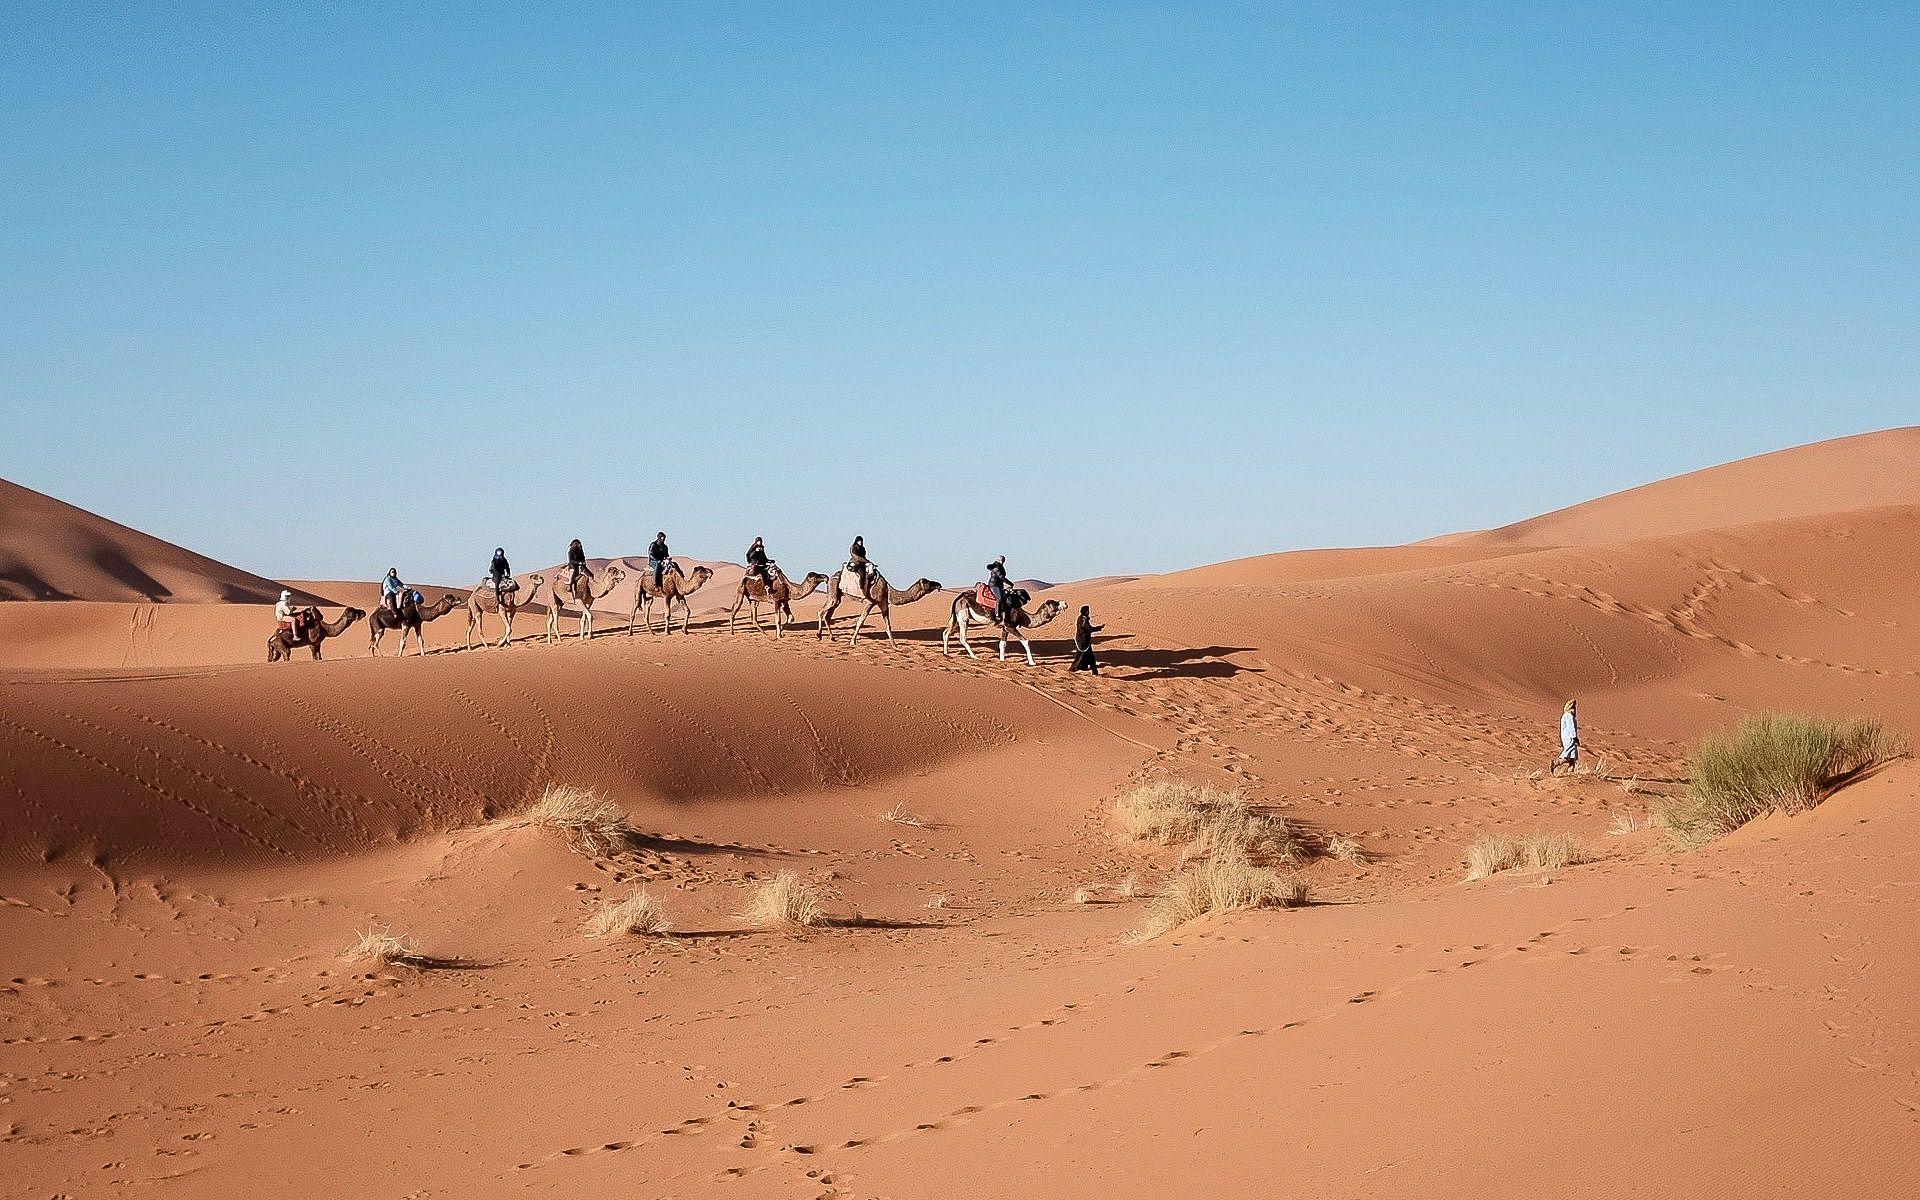 LesVoyageuses-organiser-voyage-egypte-conseils-15